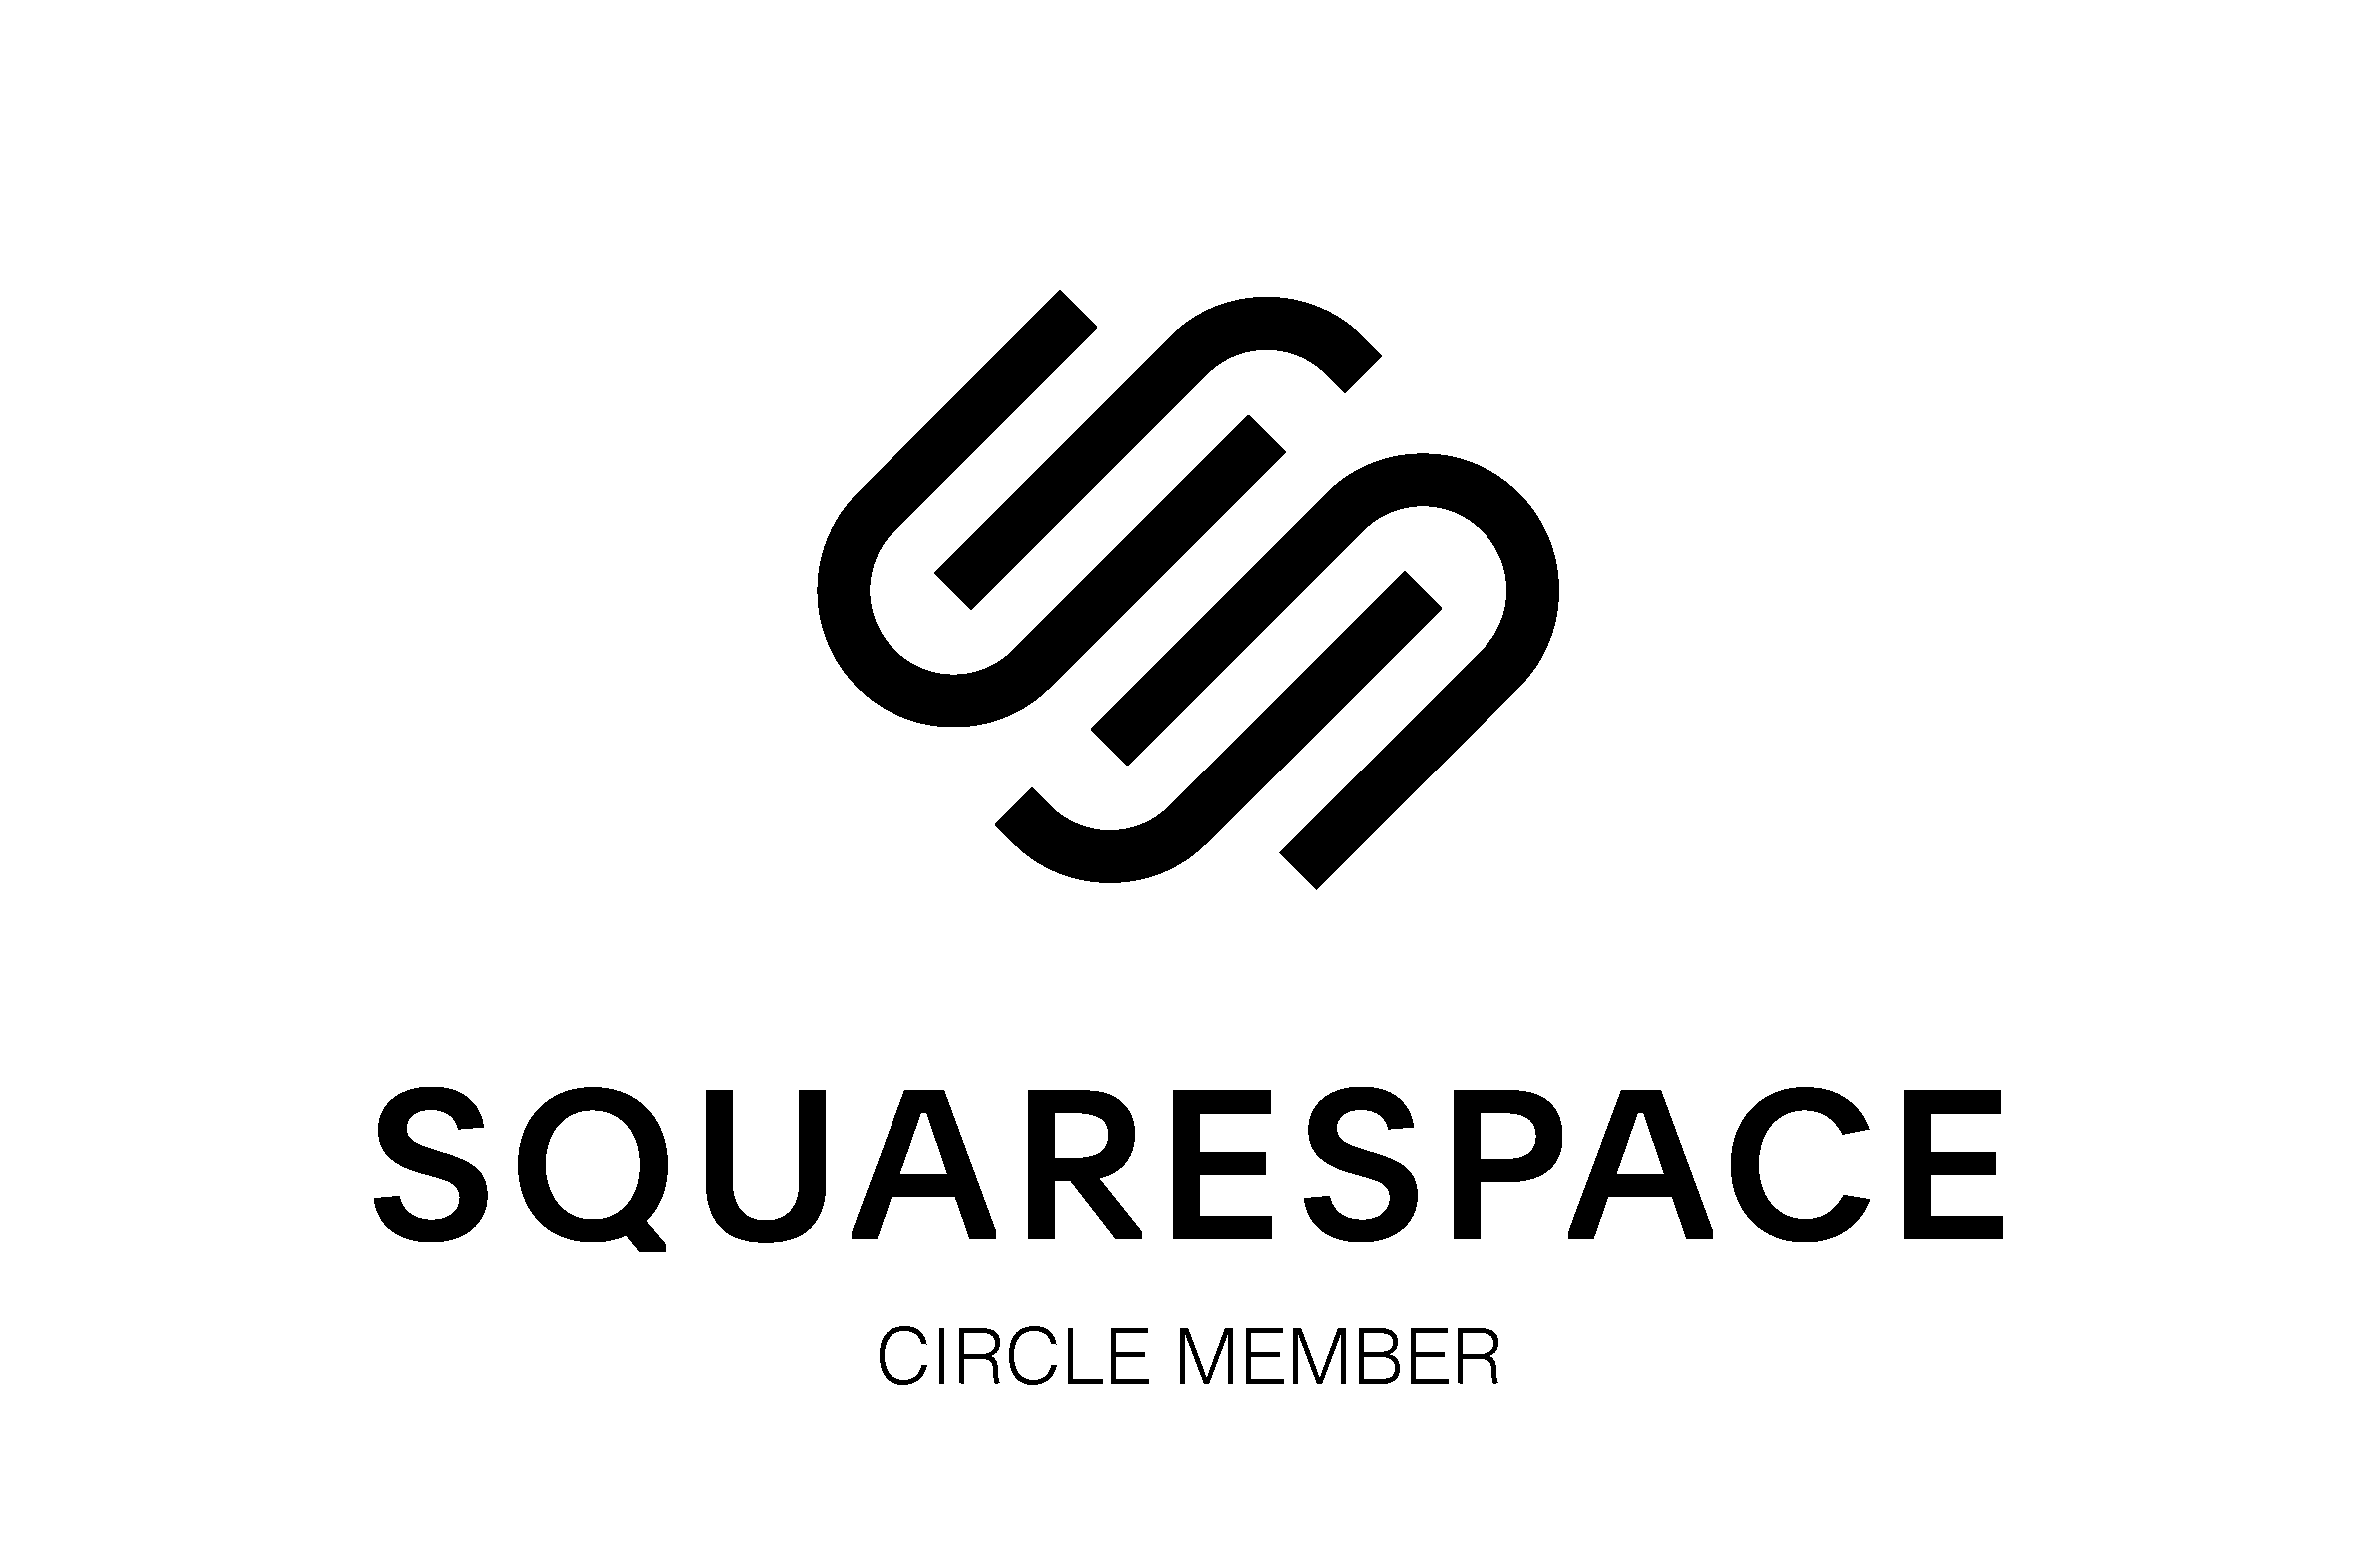 squarespace-logo-stacked-black-01.png